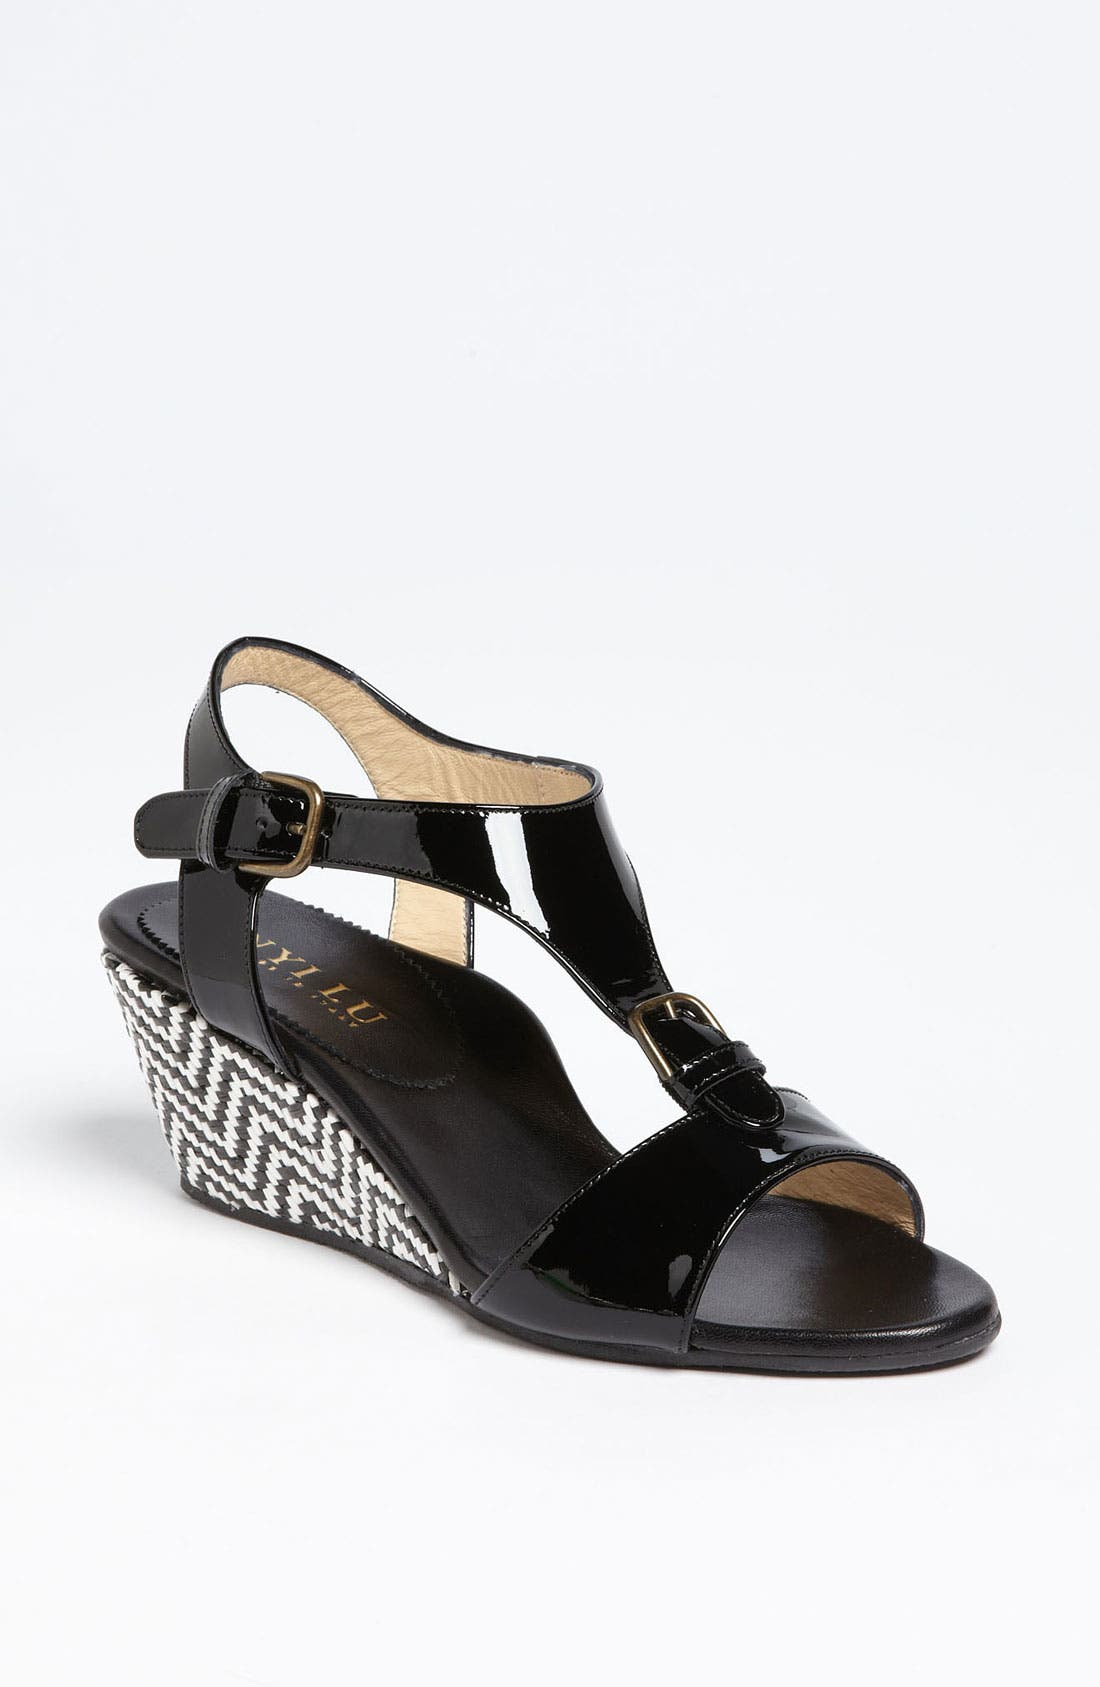 Alternate Image 1 Selected - Anyi Lu 'Lola' Sandal